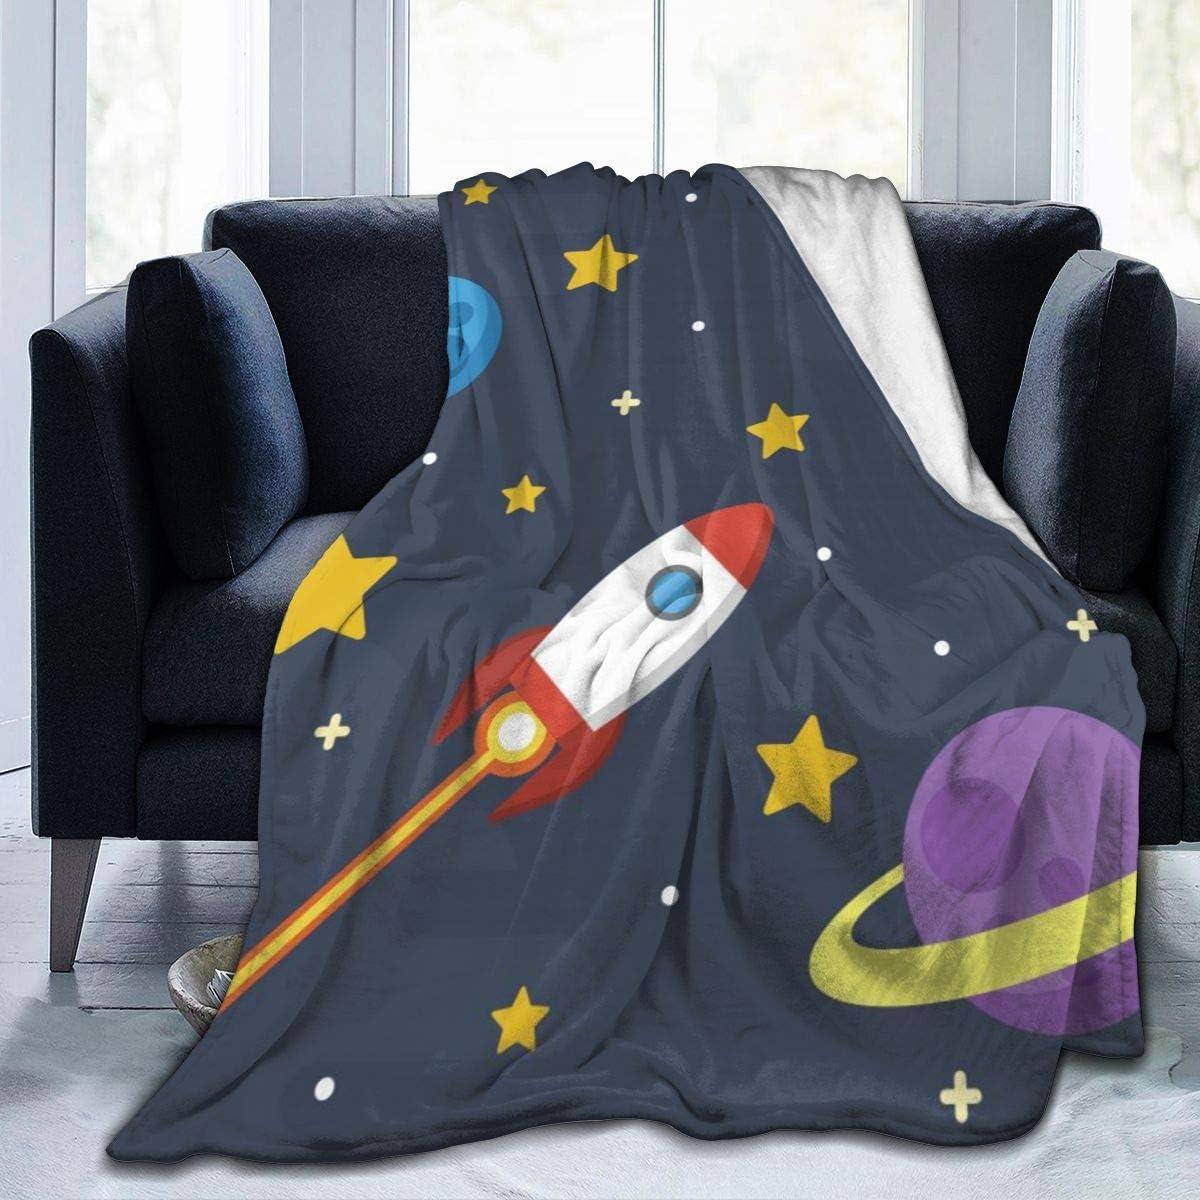 Details about  /Blue Cartoon Space Moon Print Fleece Throw Blanket